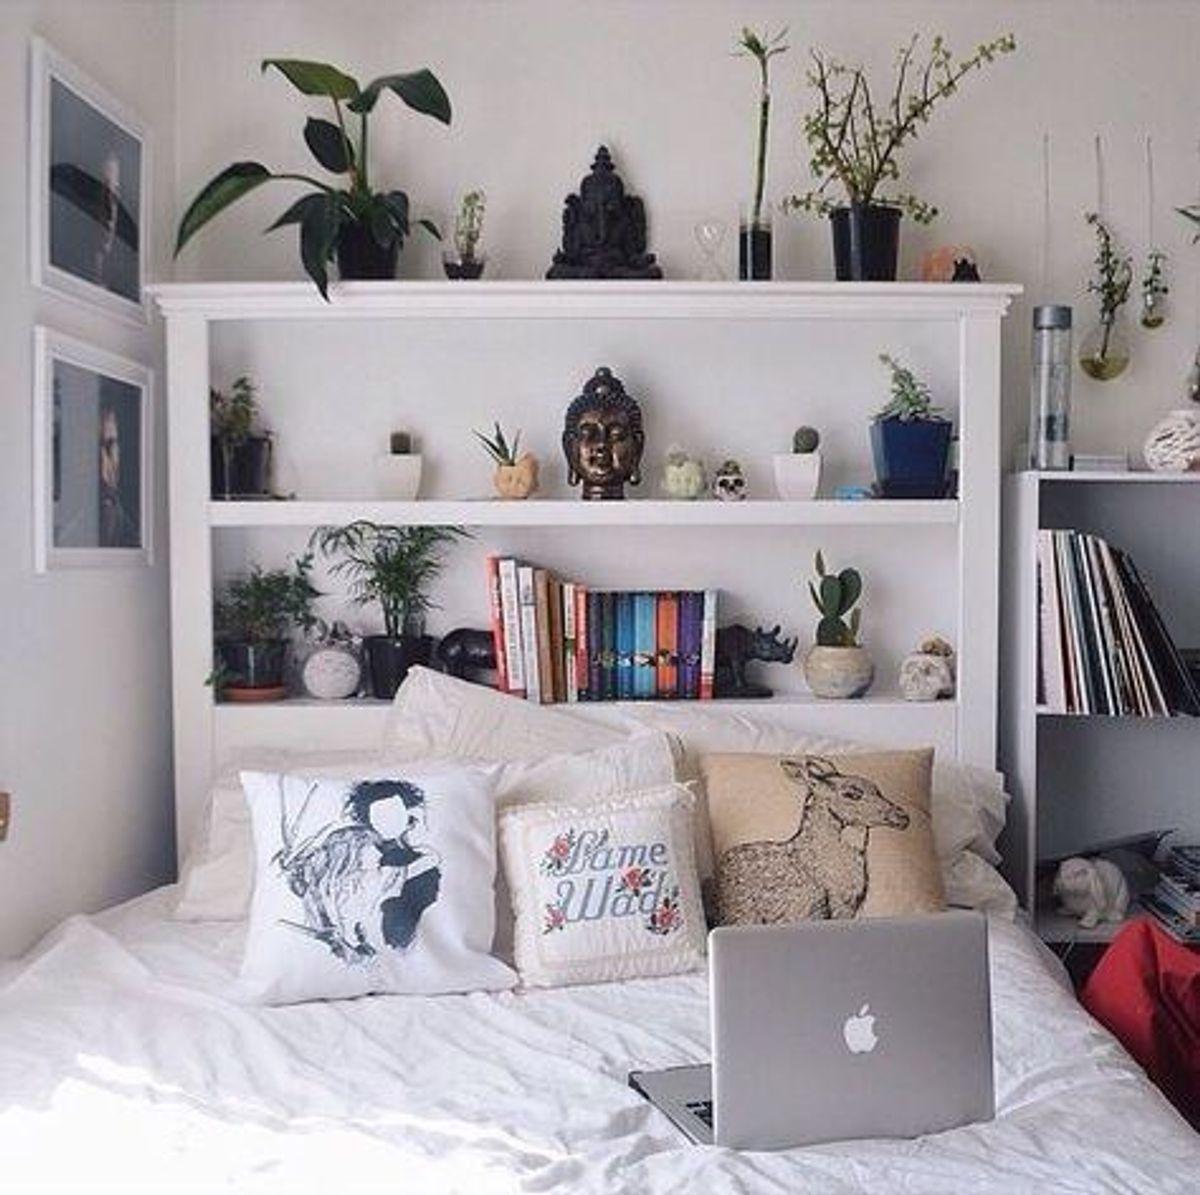 10 Best Plants For Dorm Rooms